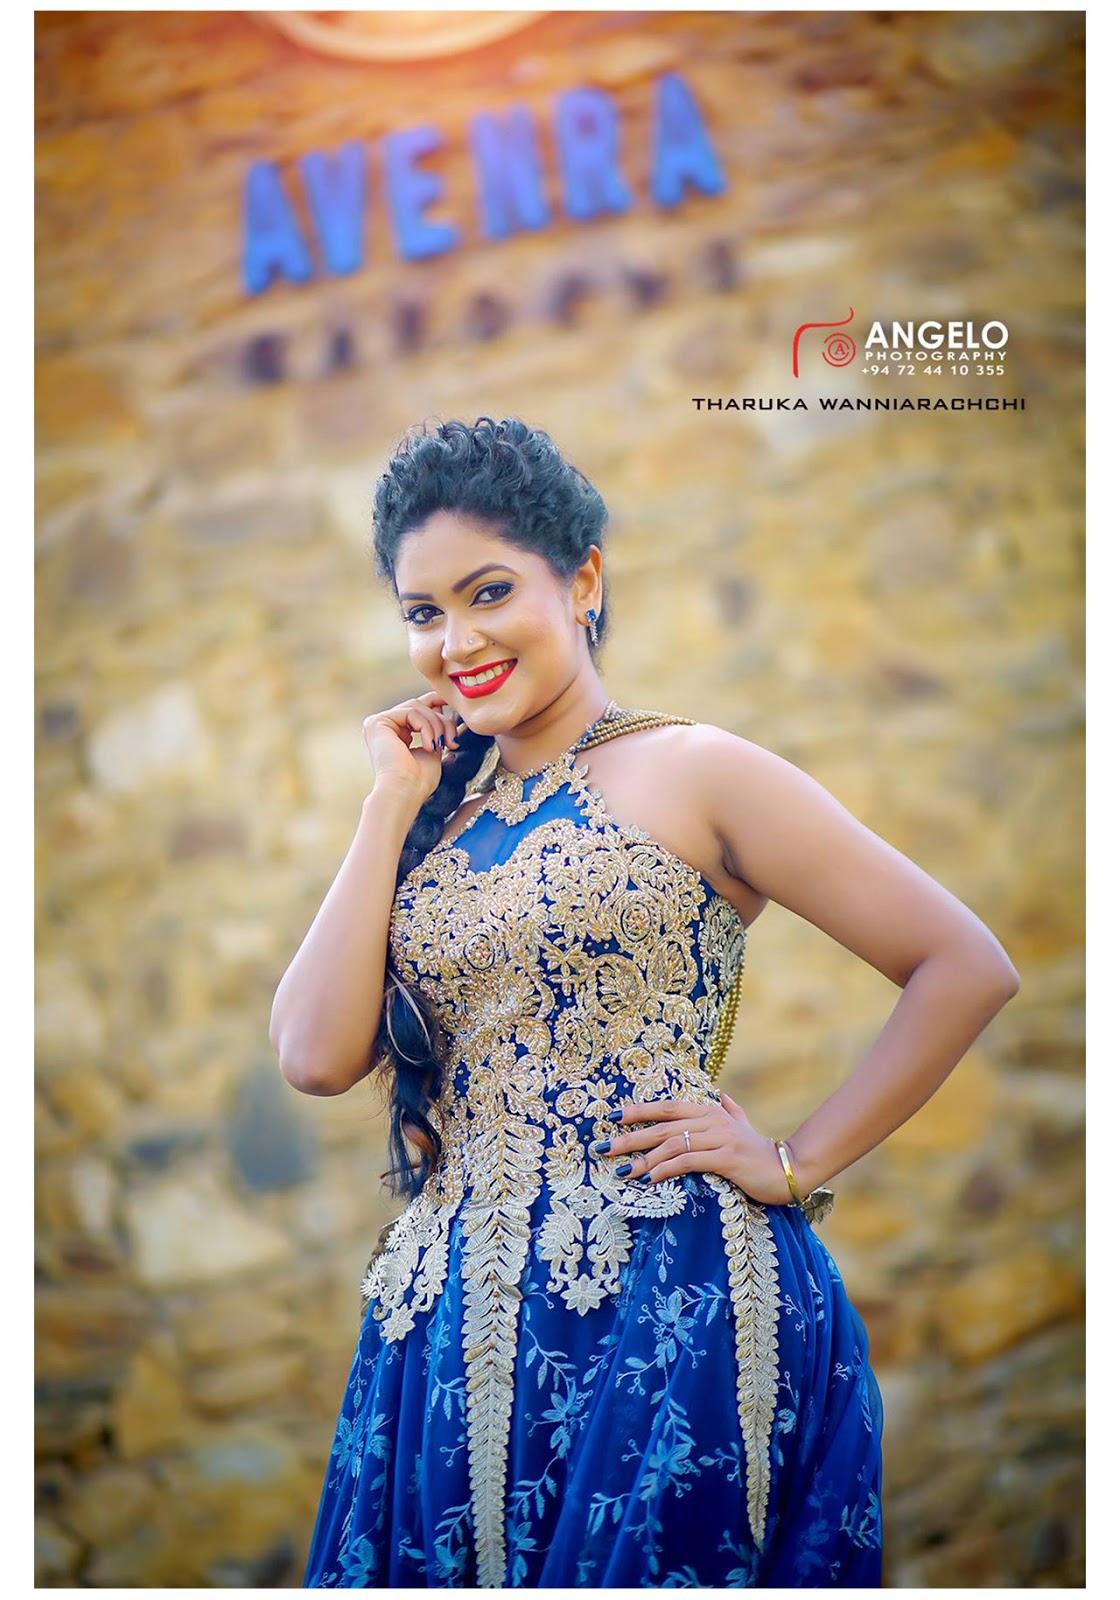 image Sri lankan sharmi model kumar